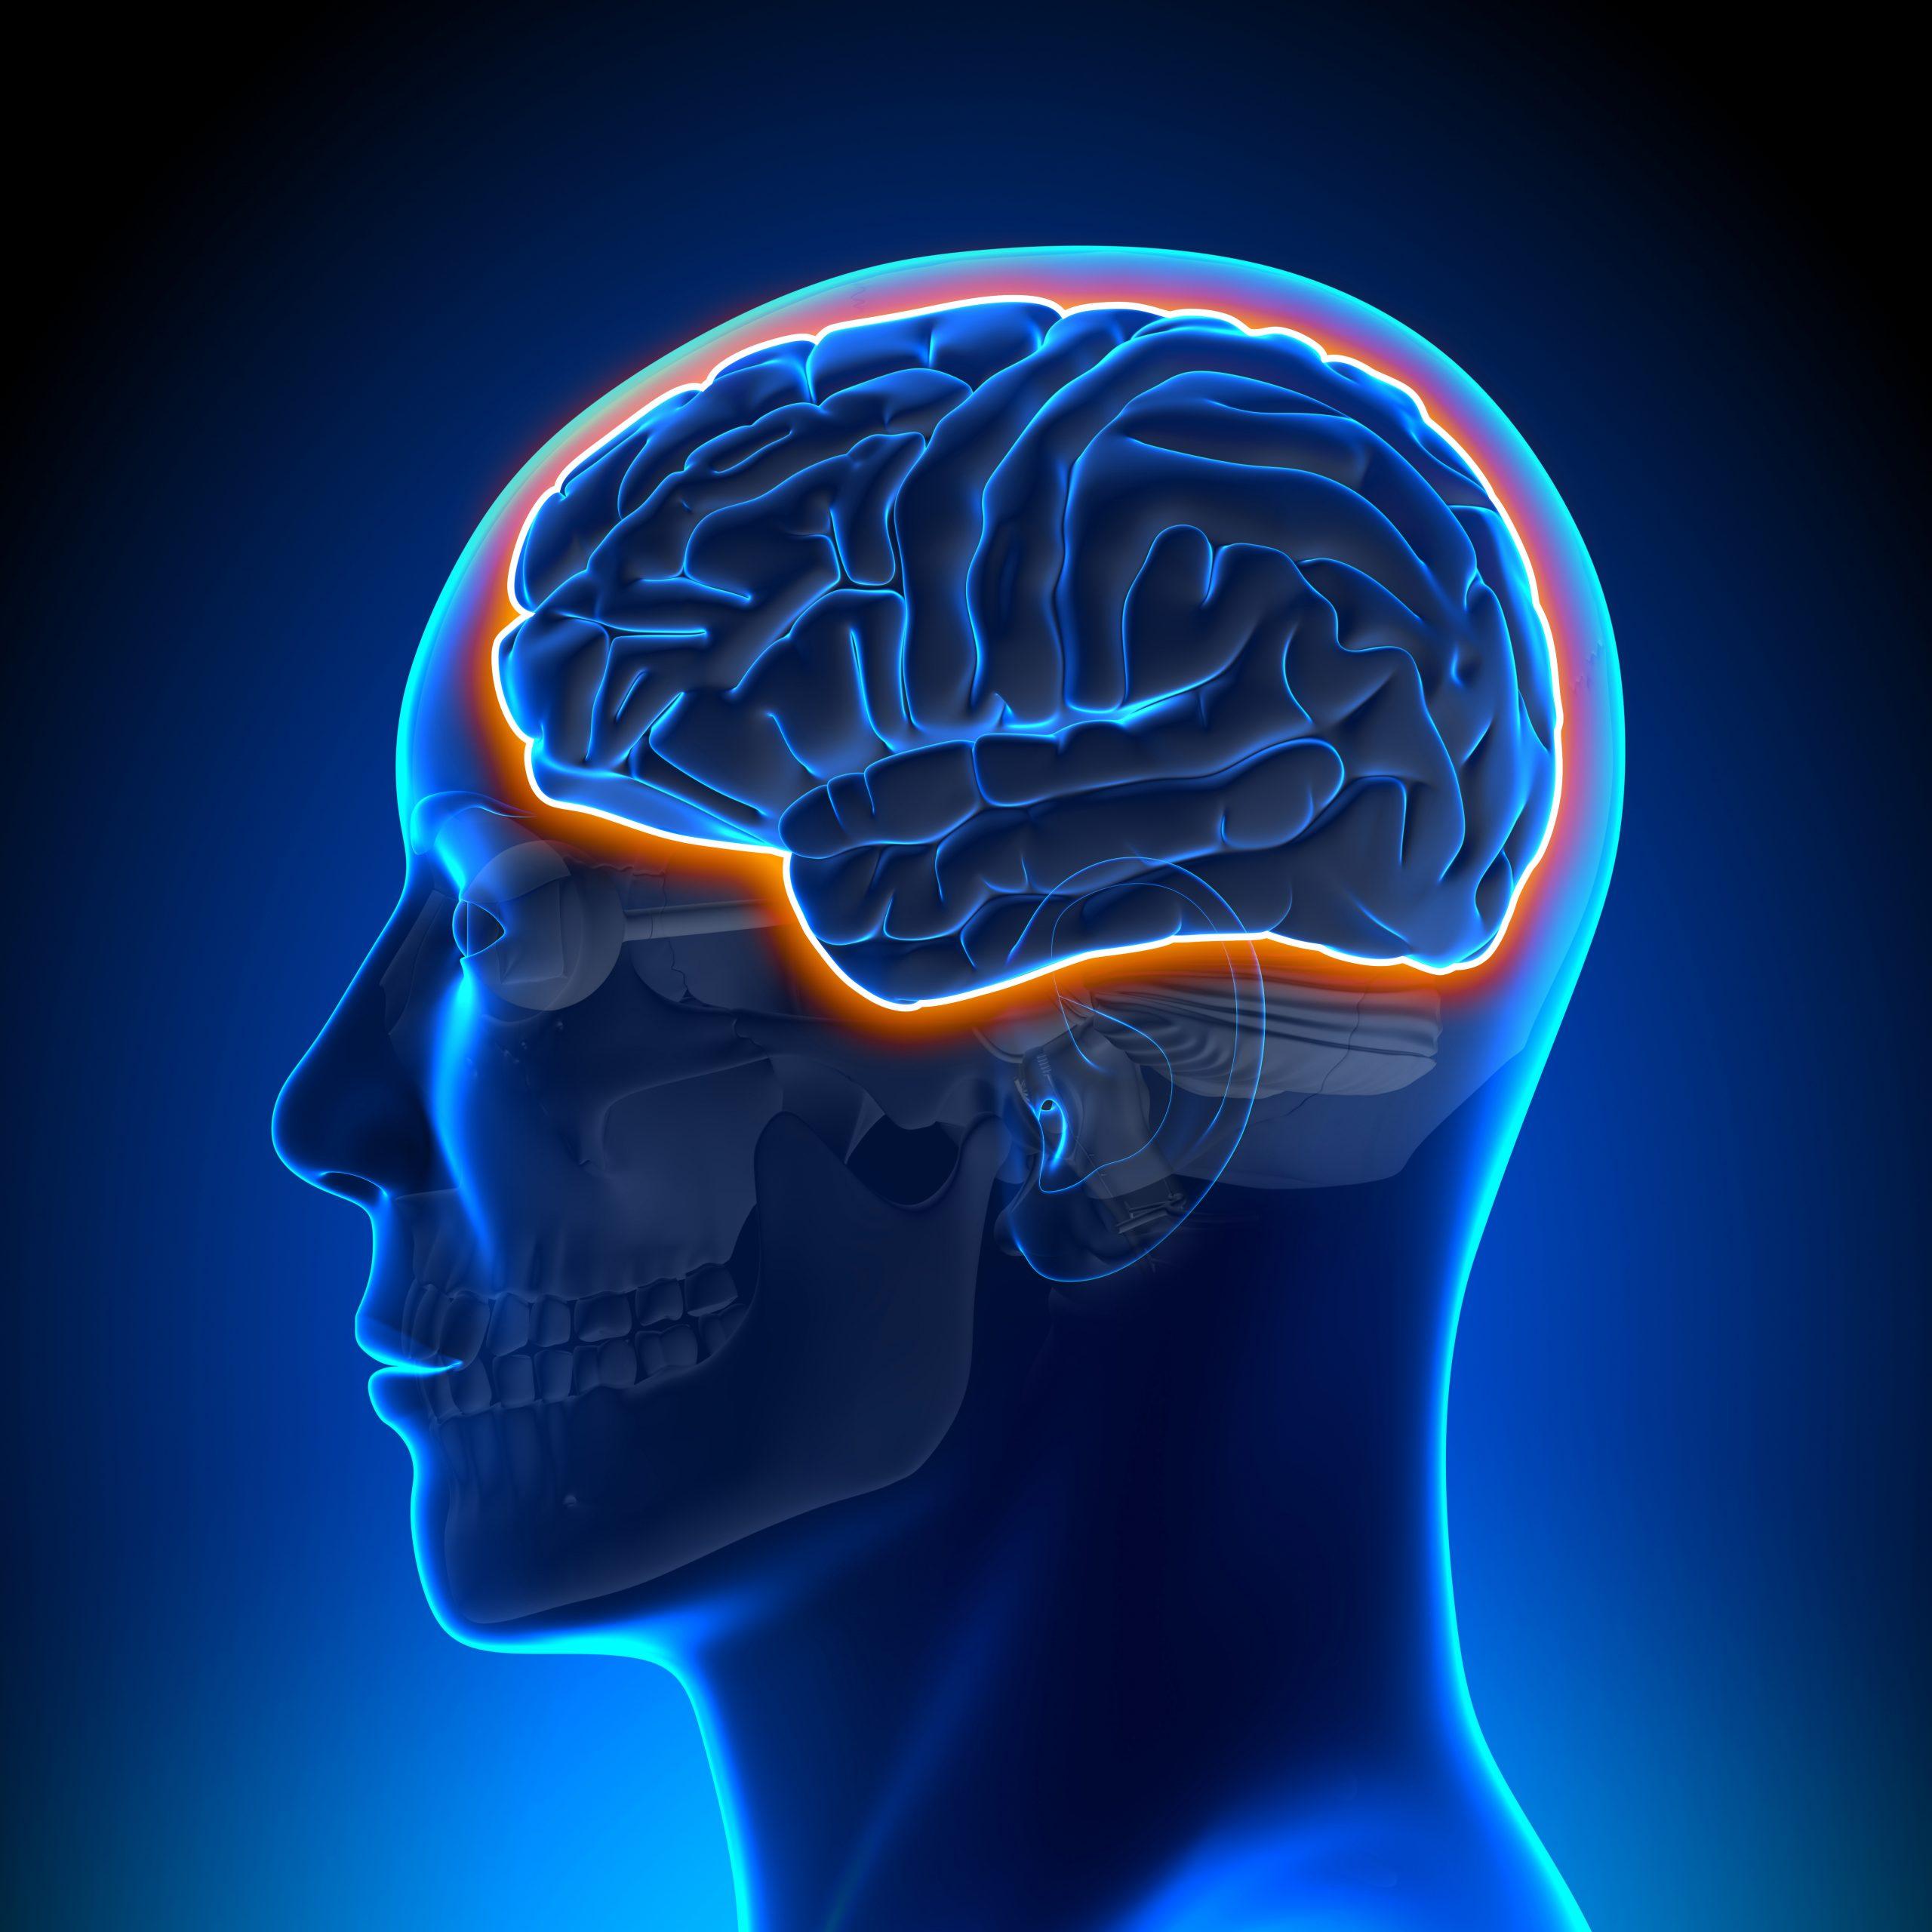 hydrogel brain stimulation Parkinsons/parkinsonsnewstoday.com/brain stimulation treatment